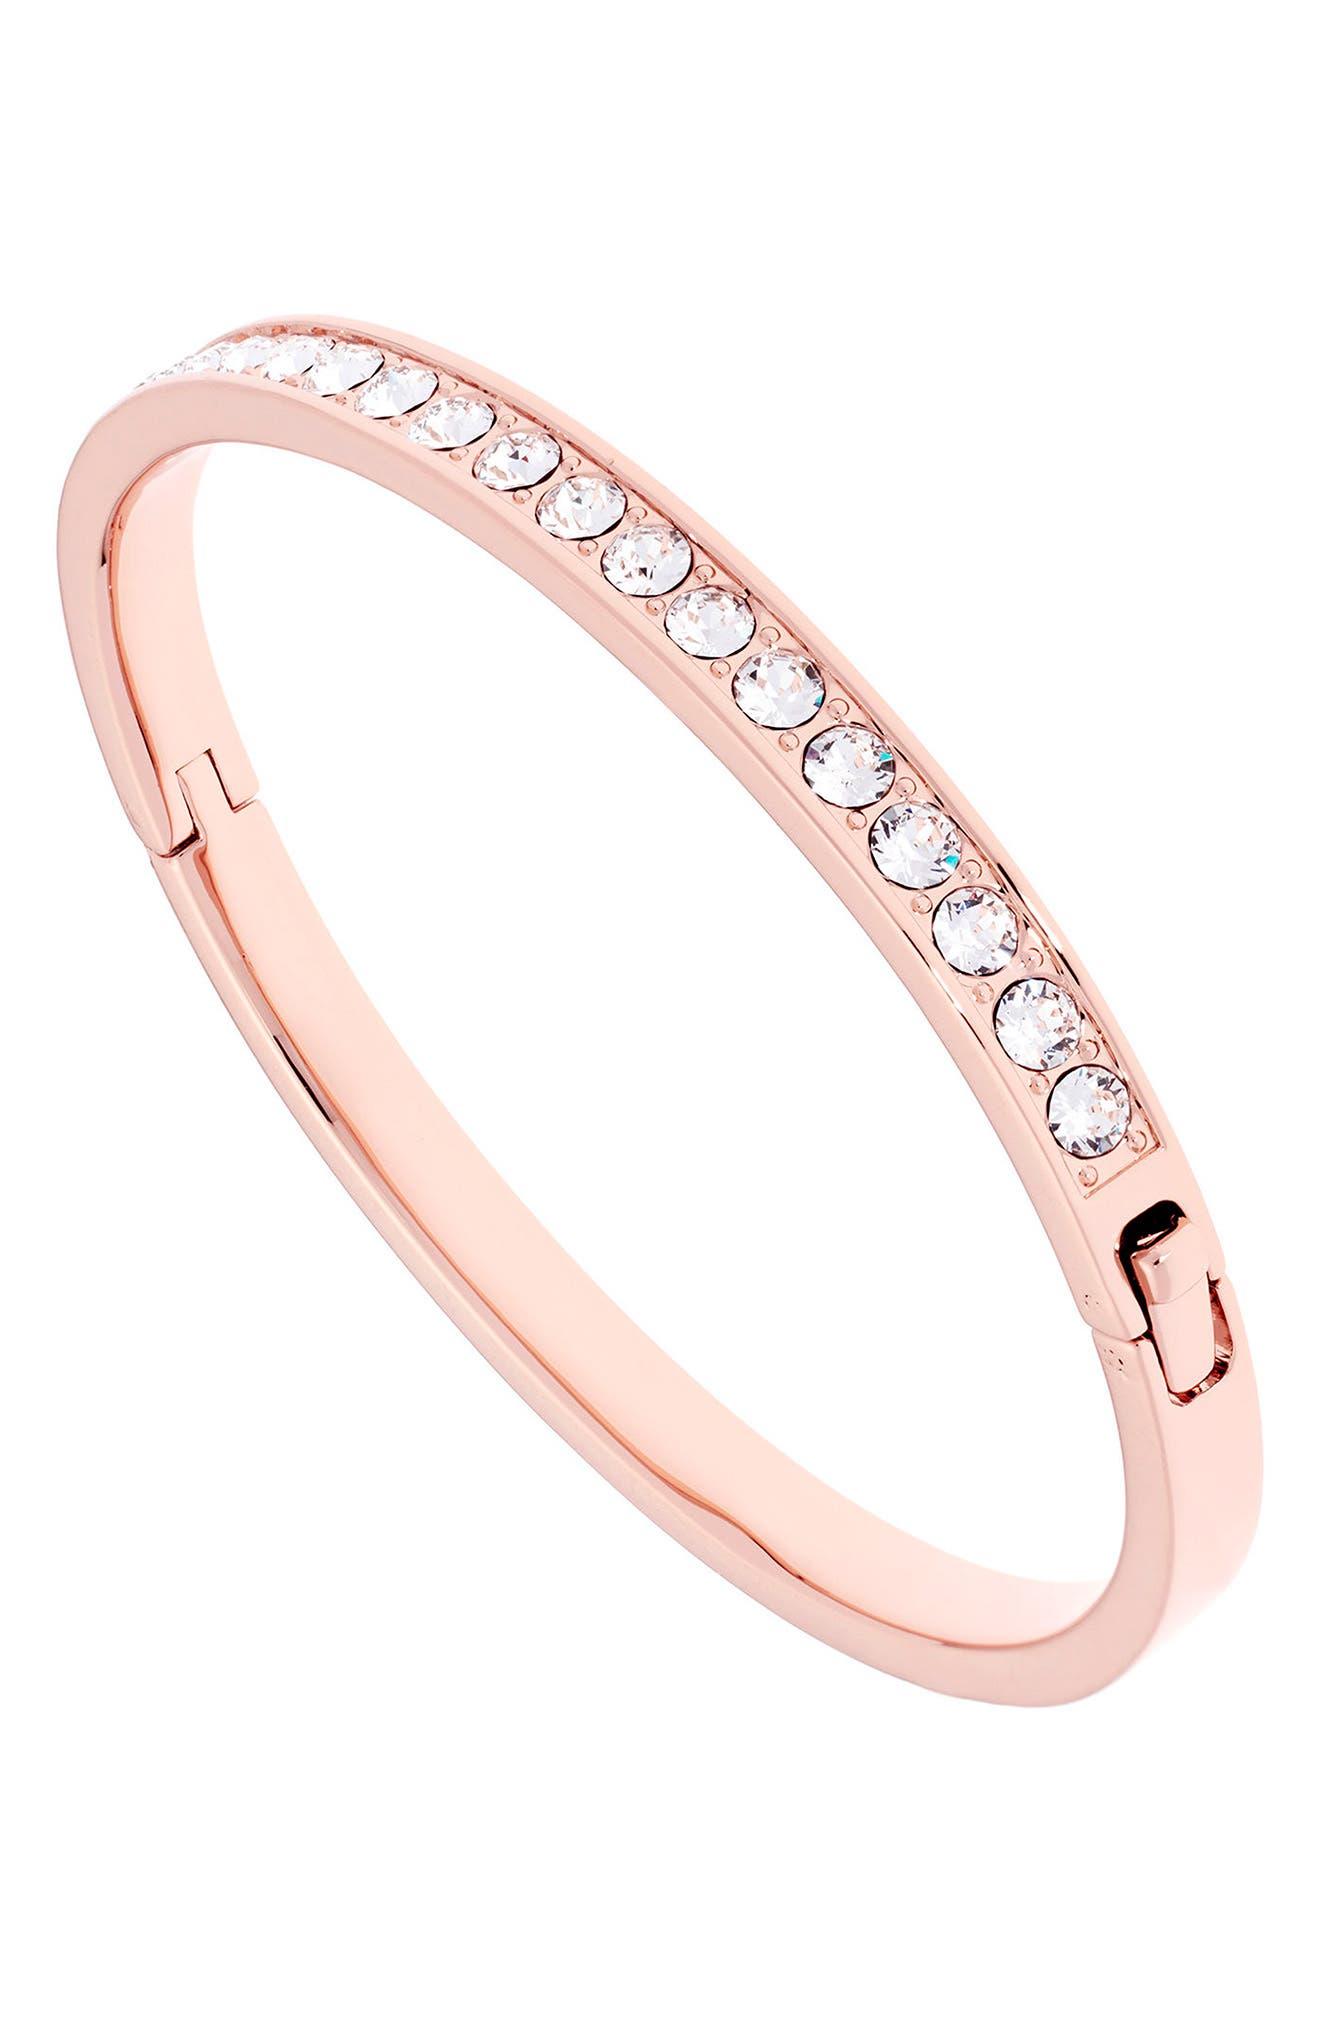 Clemara Hinge Bangle Bracelet,                             Alternate thumbnail 2, color,                             Crystal